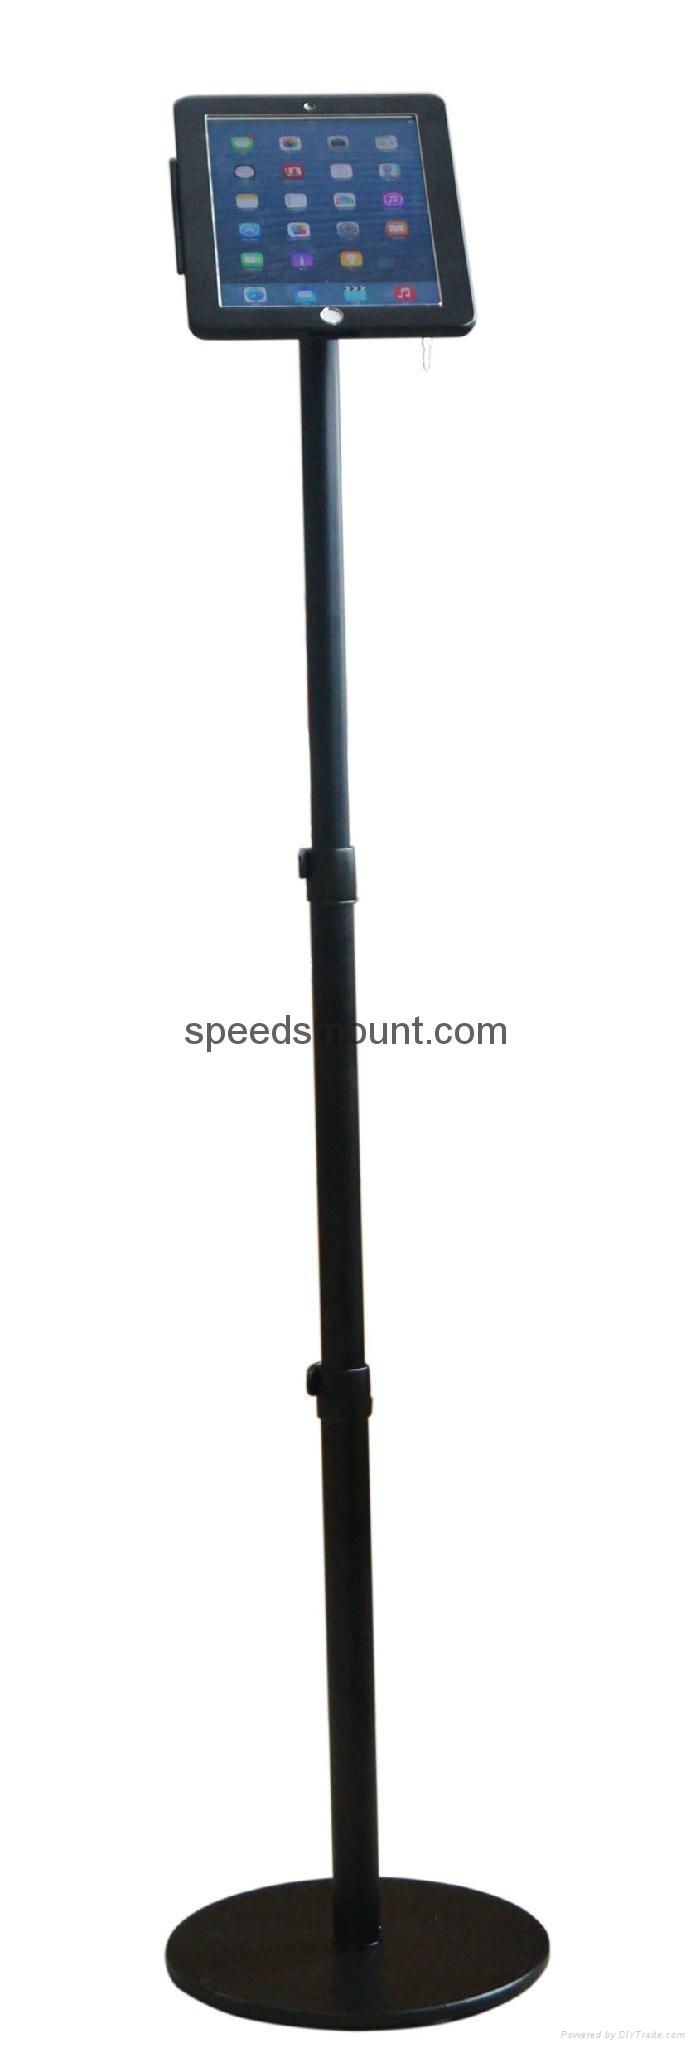 P25007 IPAD stand height adjustable whatsapp +65 84984312 singapore stock  2